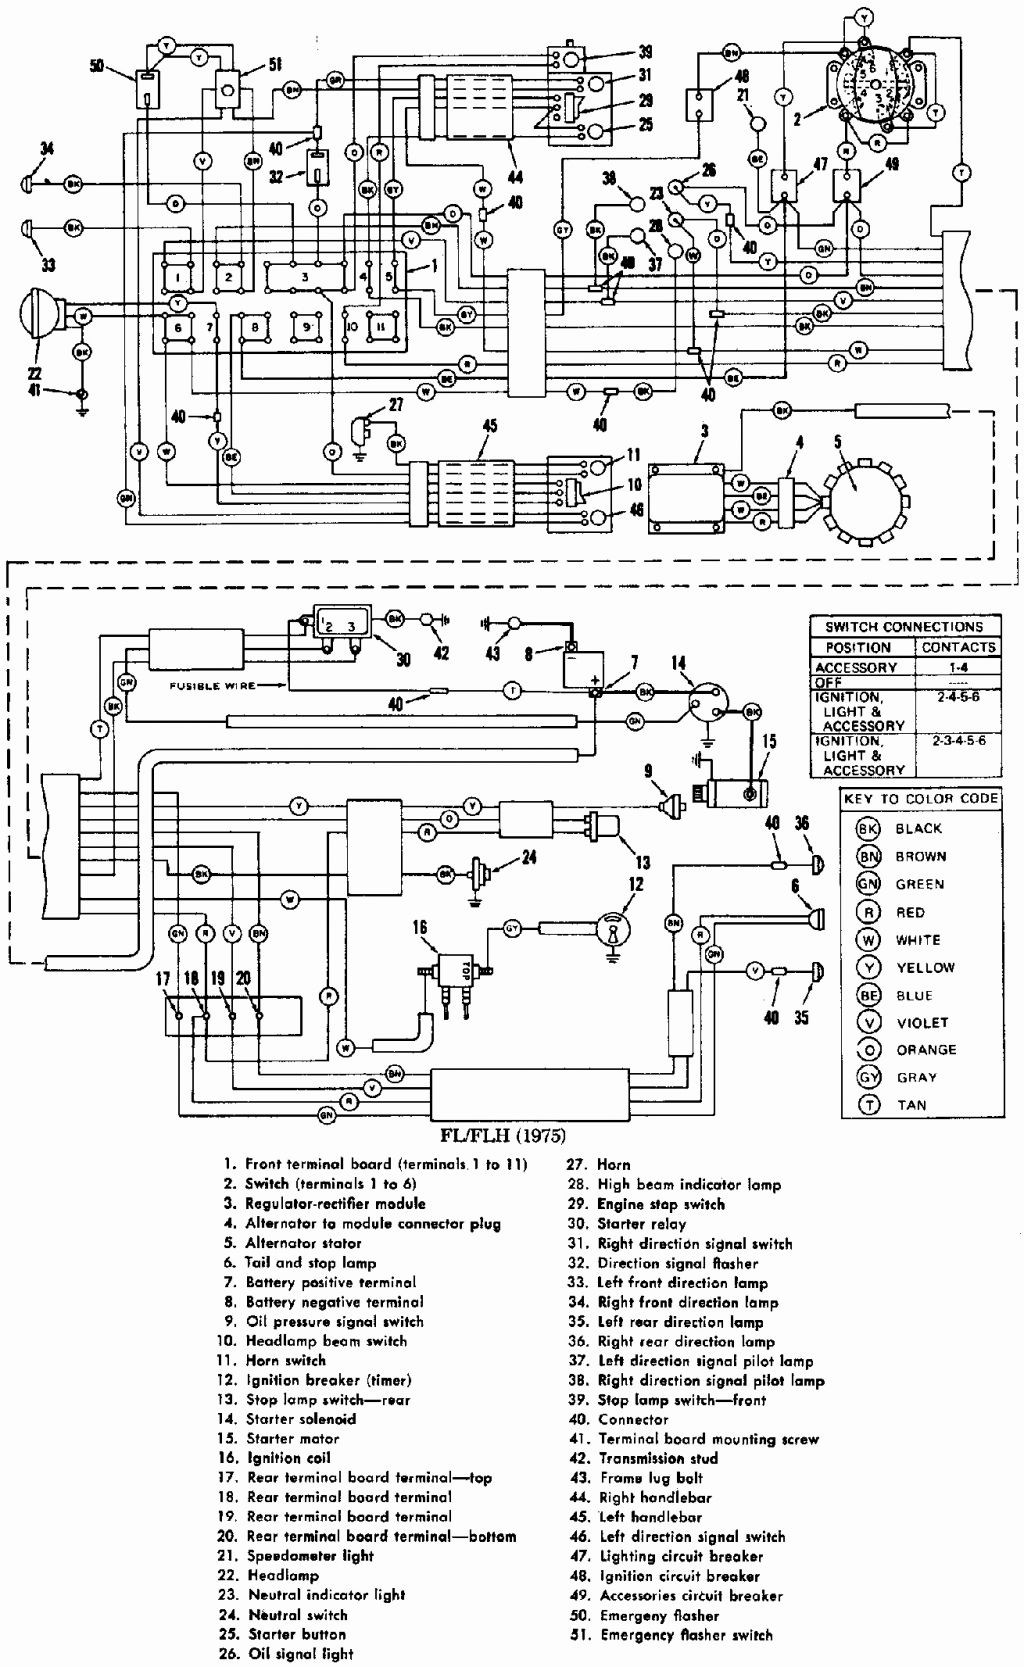 HARLEY DAVIDSON ROAD KING FUEL GAUGE WIRING DIAGRAM - Auto ... on 2000 chevy tracker fuel tank, 2004 chevrolet wiring diagram, 2004 chevy silverado tail light wiring diagram, 2001 chevy tracker wiring diagram, 2000 chevy tracker battery, 2000 chevy tracker exhaust system, 2000 chevy tracker won't start, 2000 chevy tracker specifications, 1987 wrangler wiring diagram, 2000 chevy tracker parts, 2003 chevy impala wiring diagram, 2002 chevy tracker wiring diagram, chevy metro wiring diagram, 1999 chevy tracker wiring diagram, 2000 chevy tracker belt routing, 2004 impala wiring diagram, 2003 chevy tracker wiring diagram, 2000 chevy tracker engine, 2000 chevy tracker wheels, 2000 chevy tracker headlight,